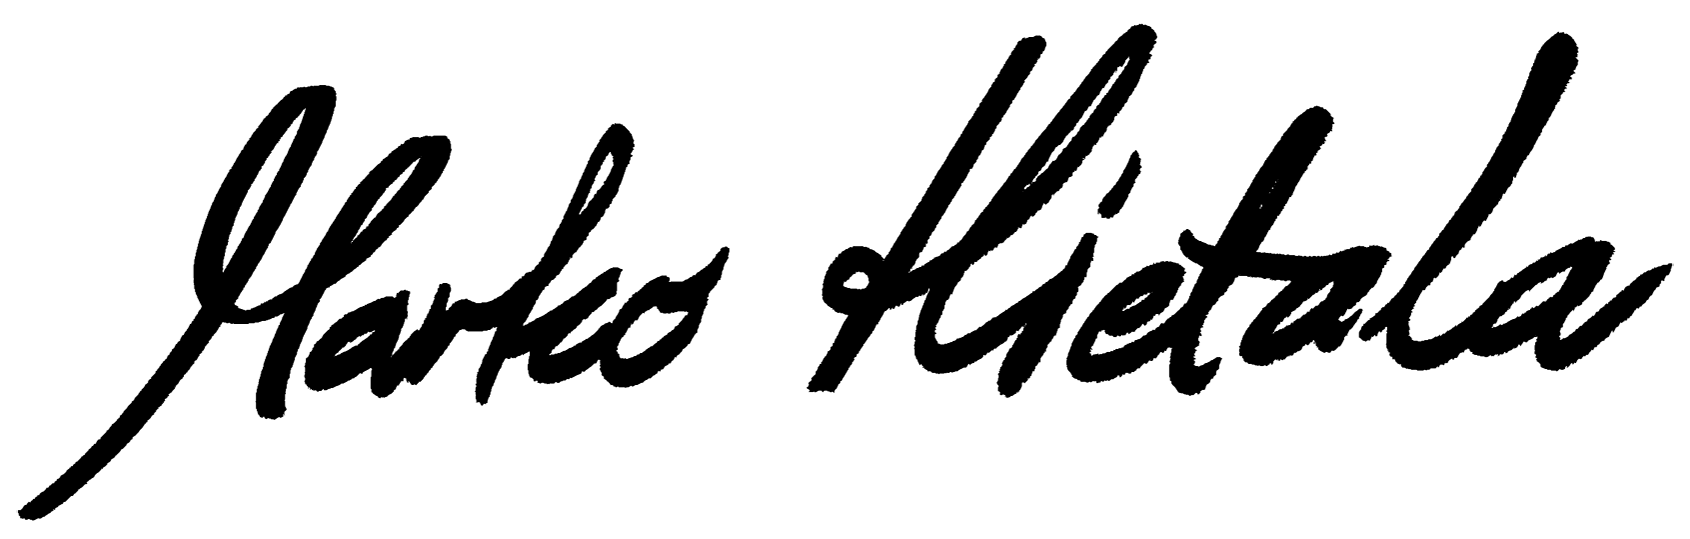 Marko Hietala Logo